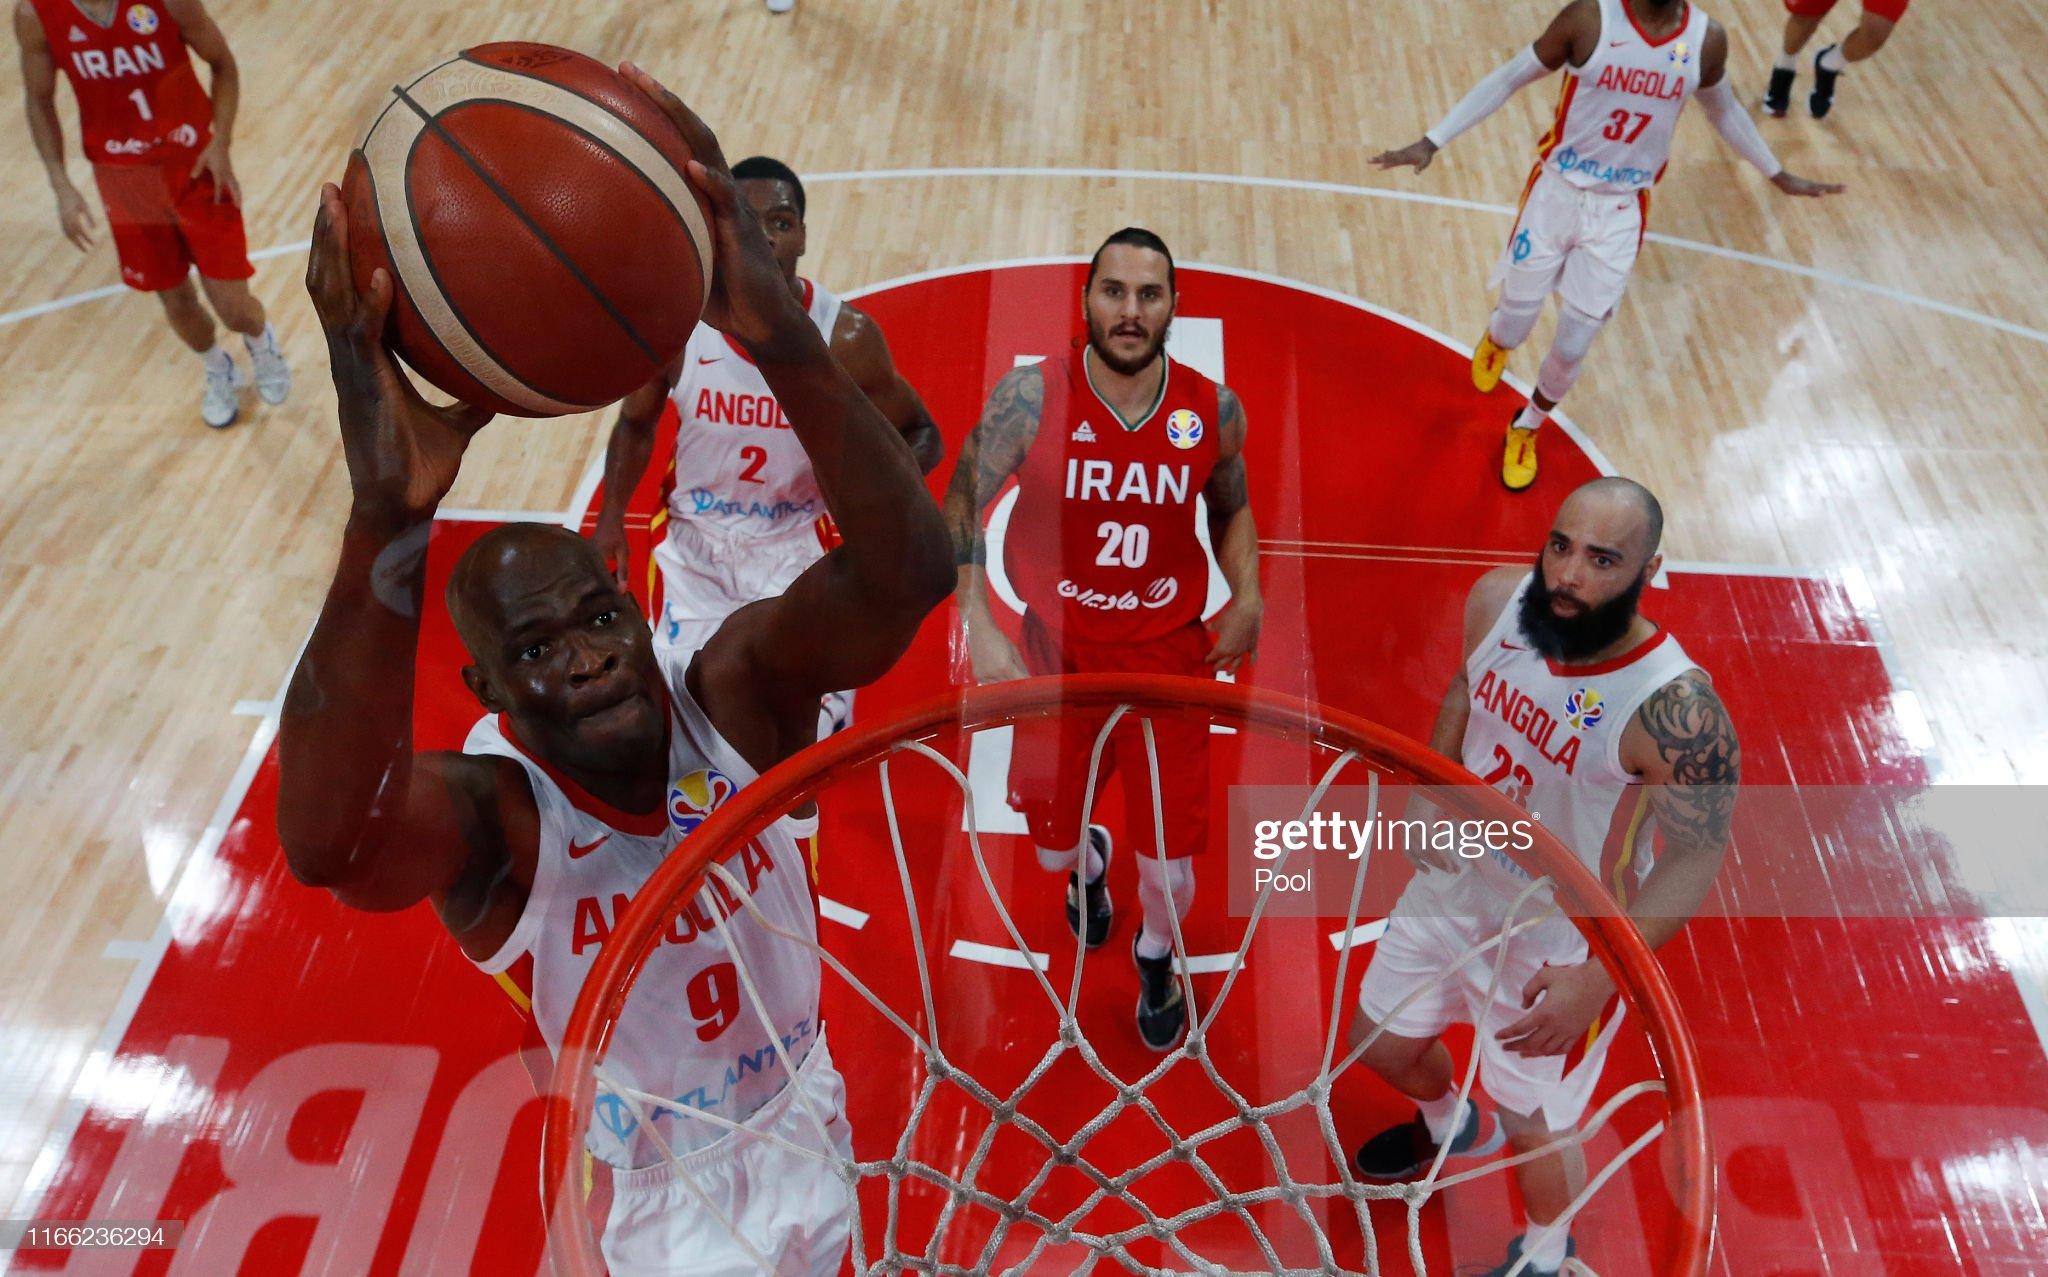 Angola v Iran: Group N - FIBA World Cup 2019 : News Photo